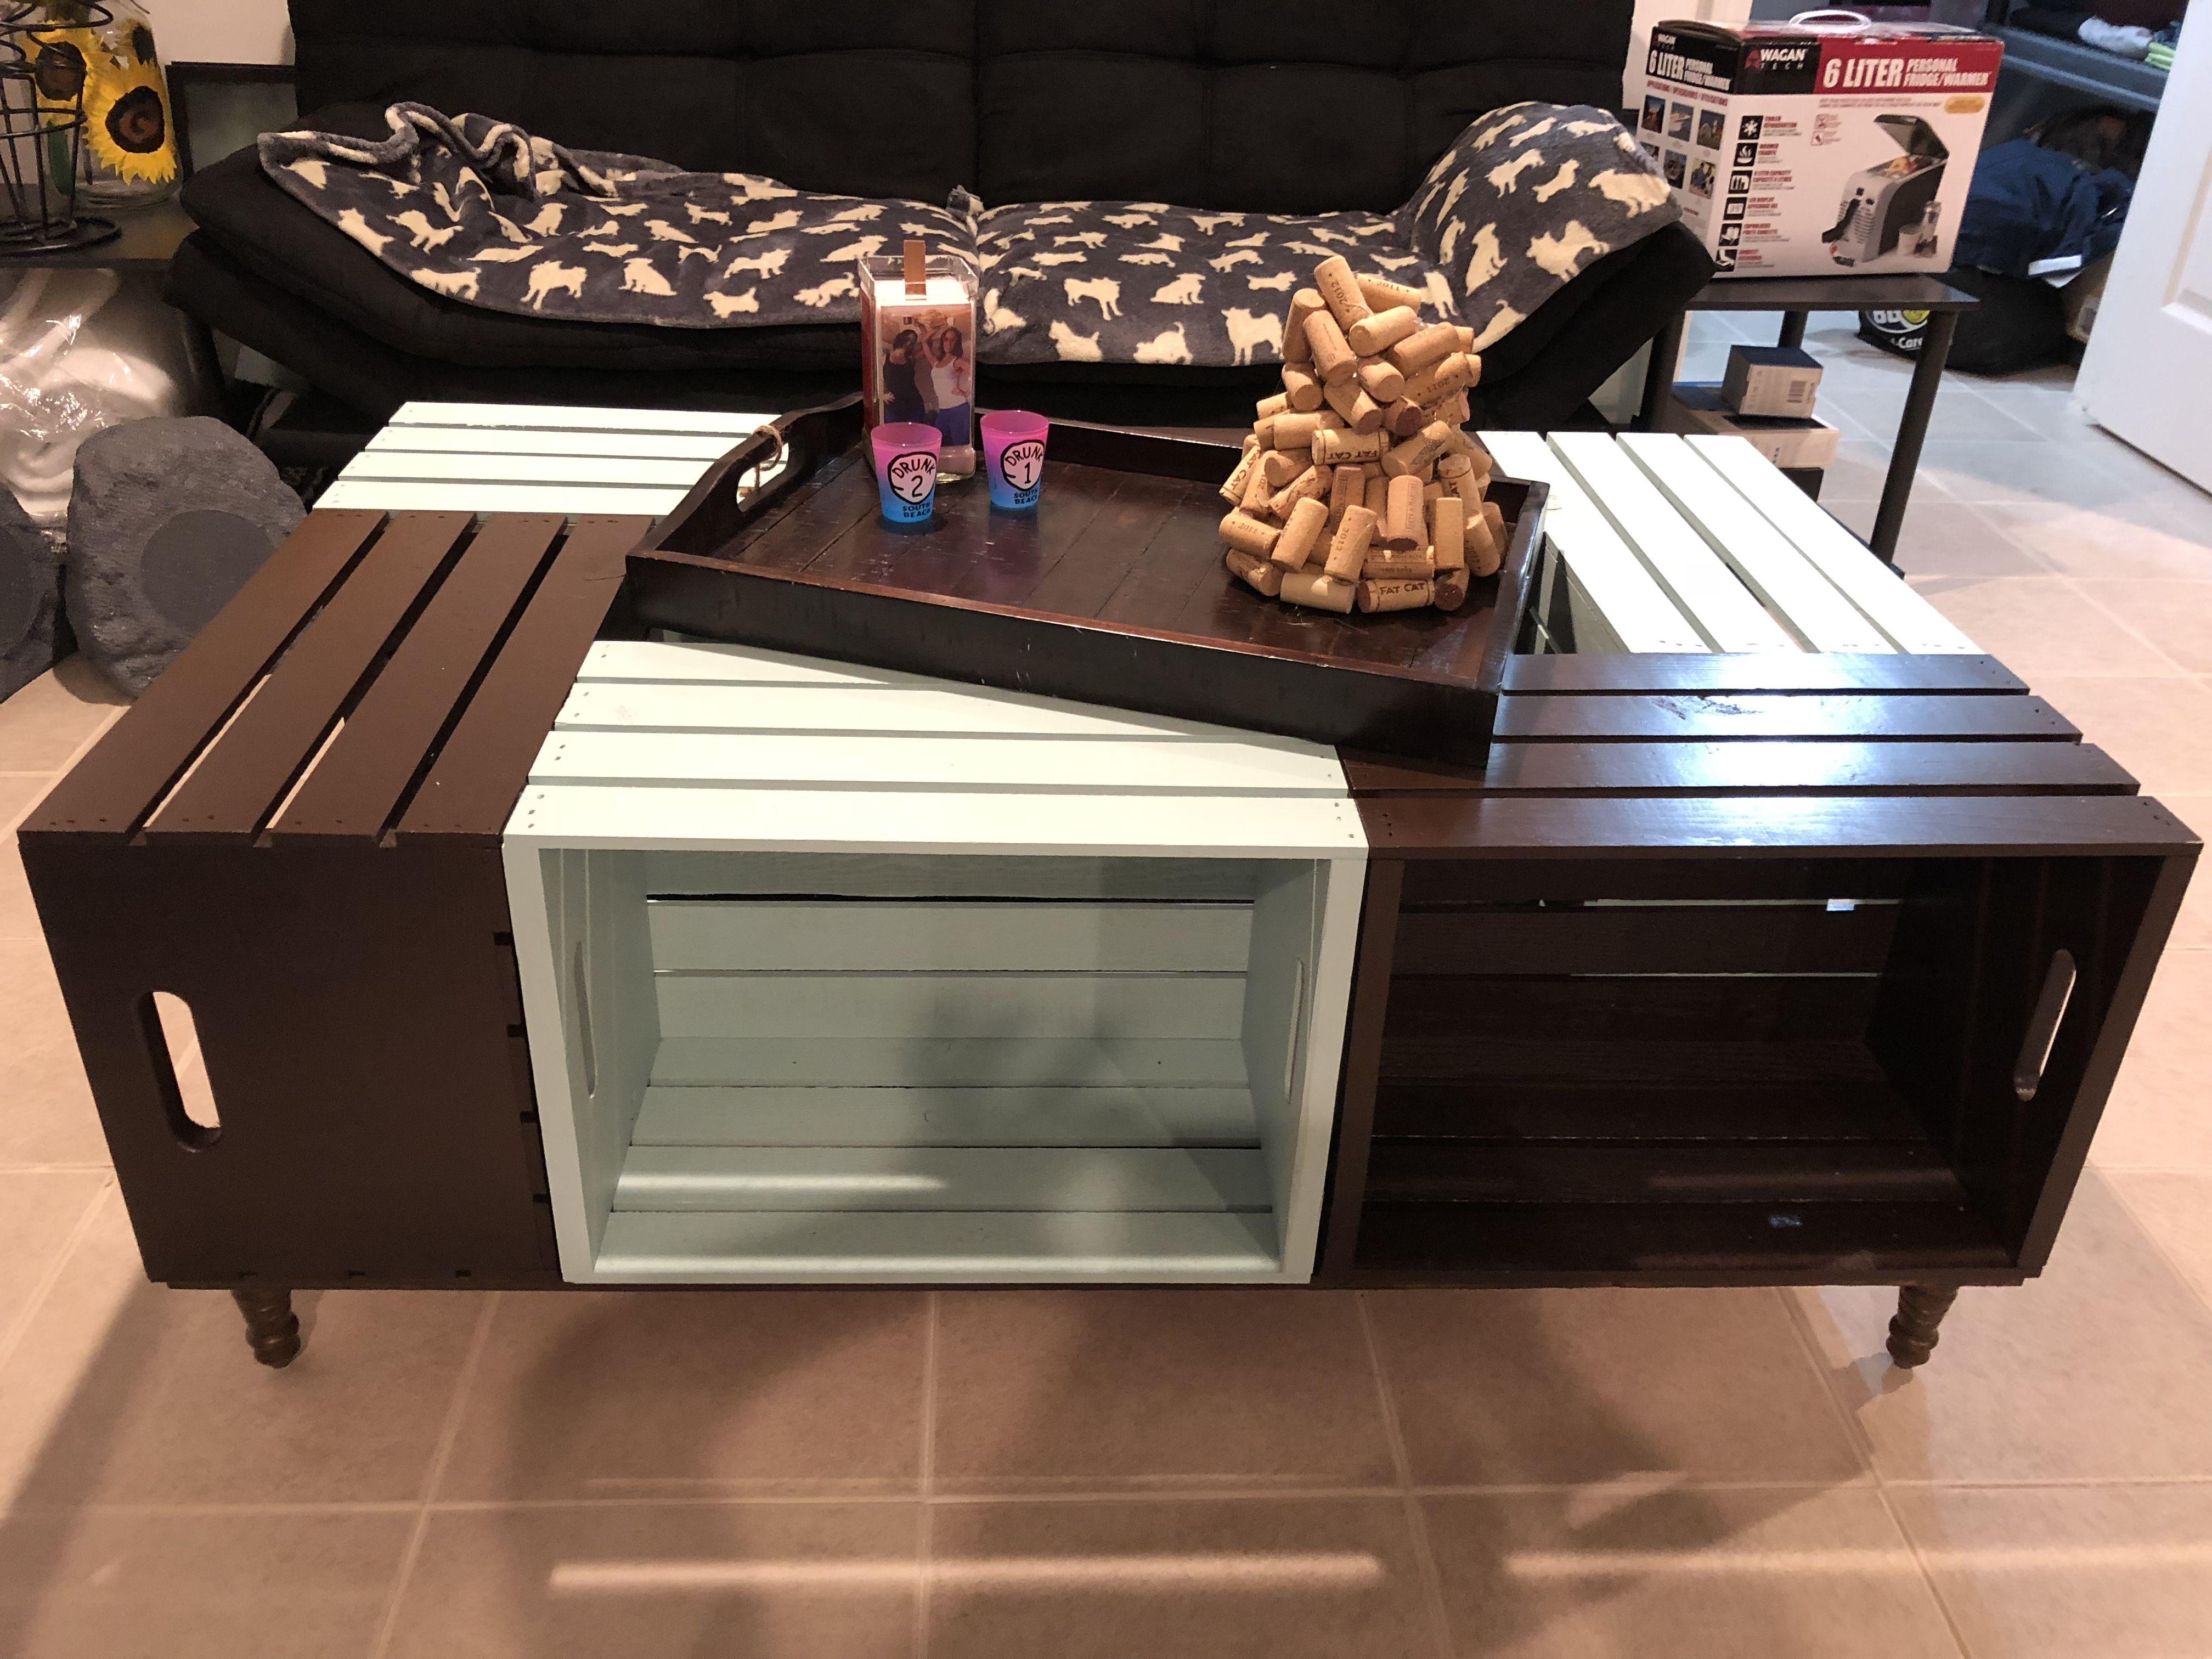 Coffee table coffee table home goods home decor